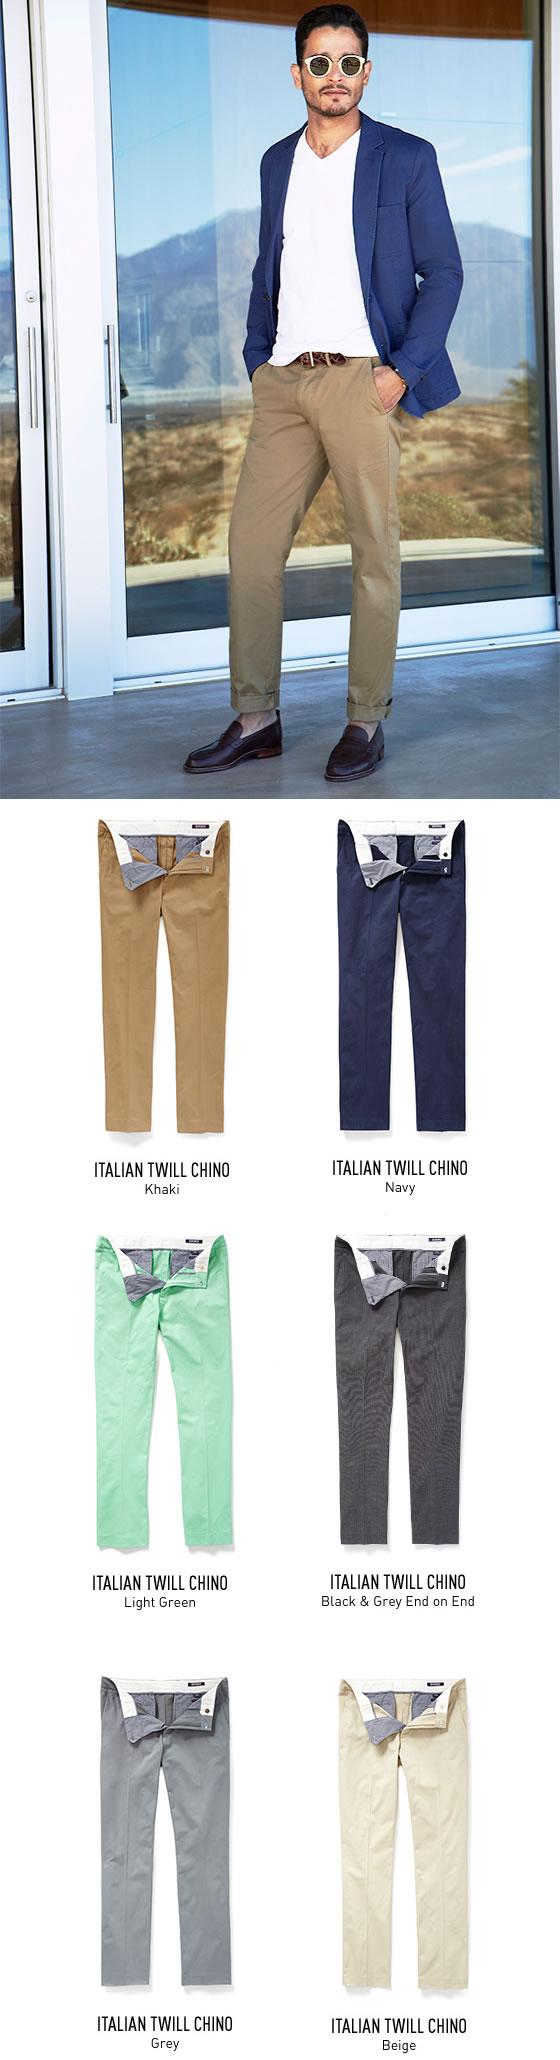 new bonobos italian twill chinos